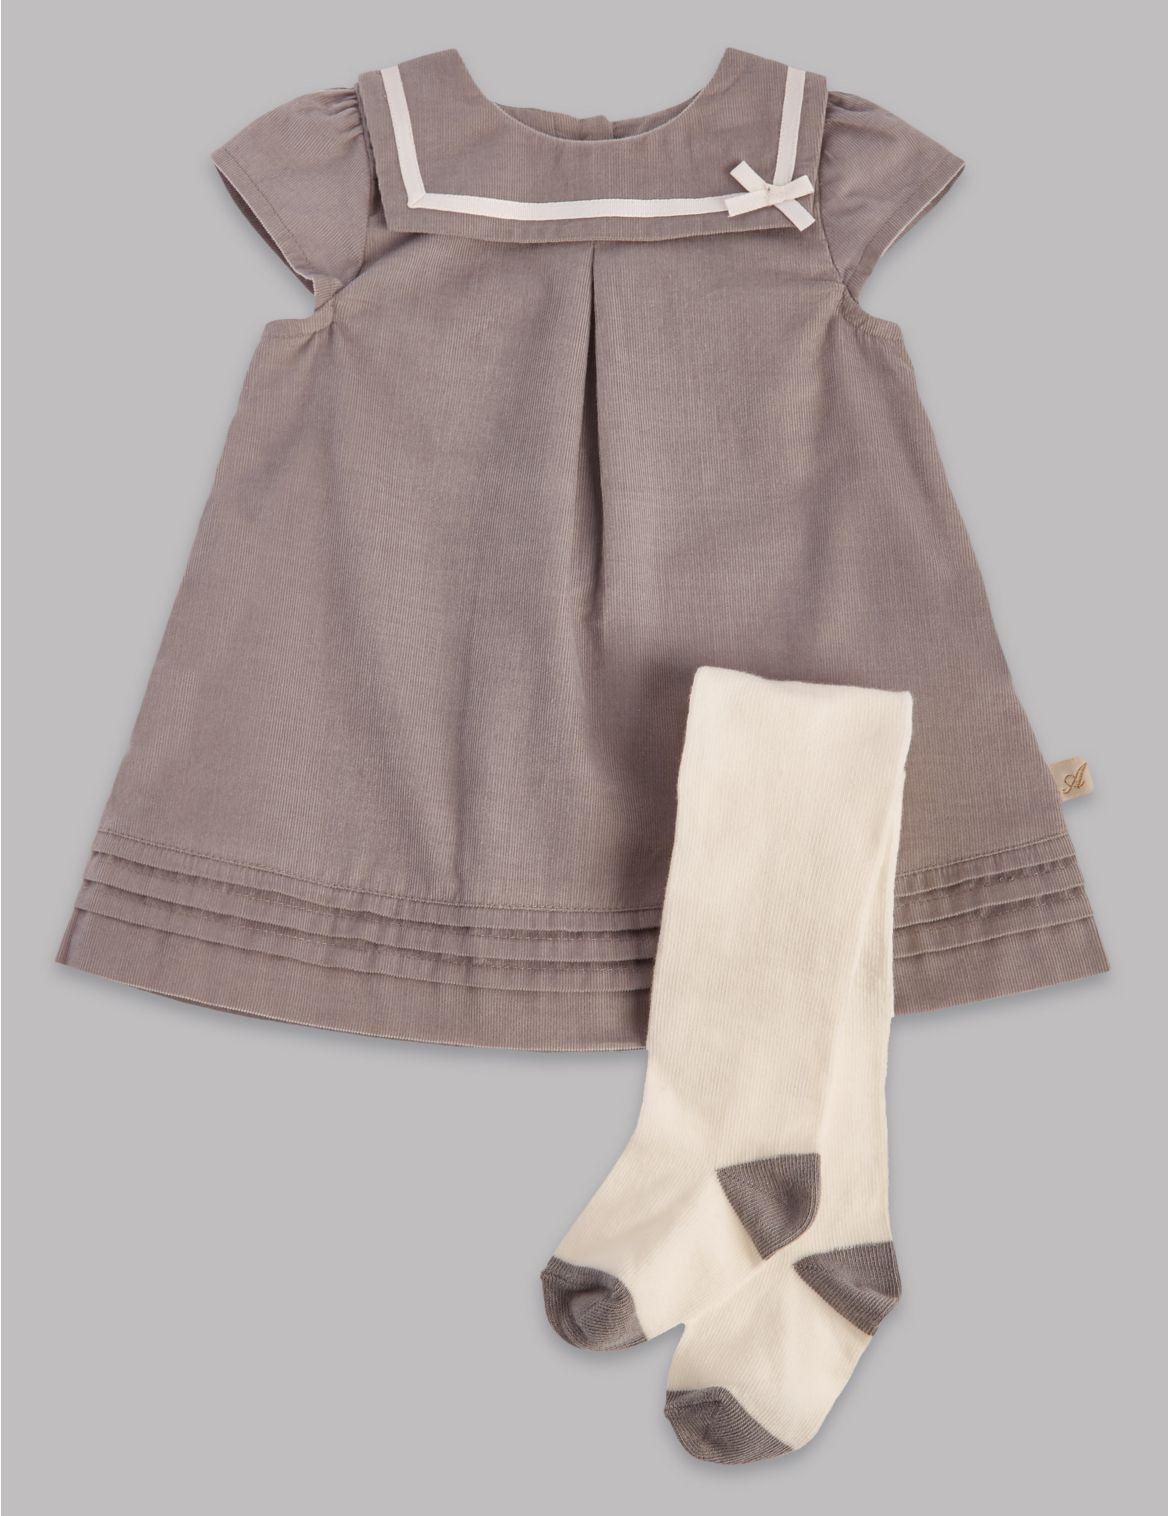 2delige outfit met corduroy